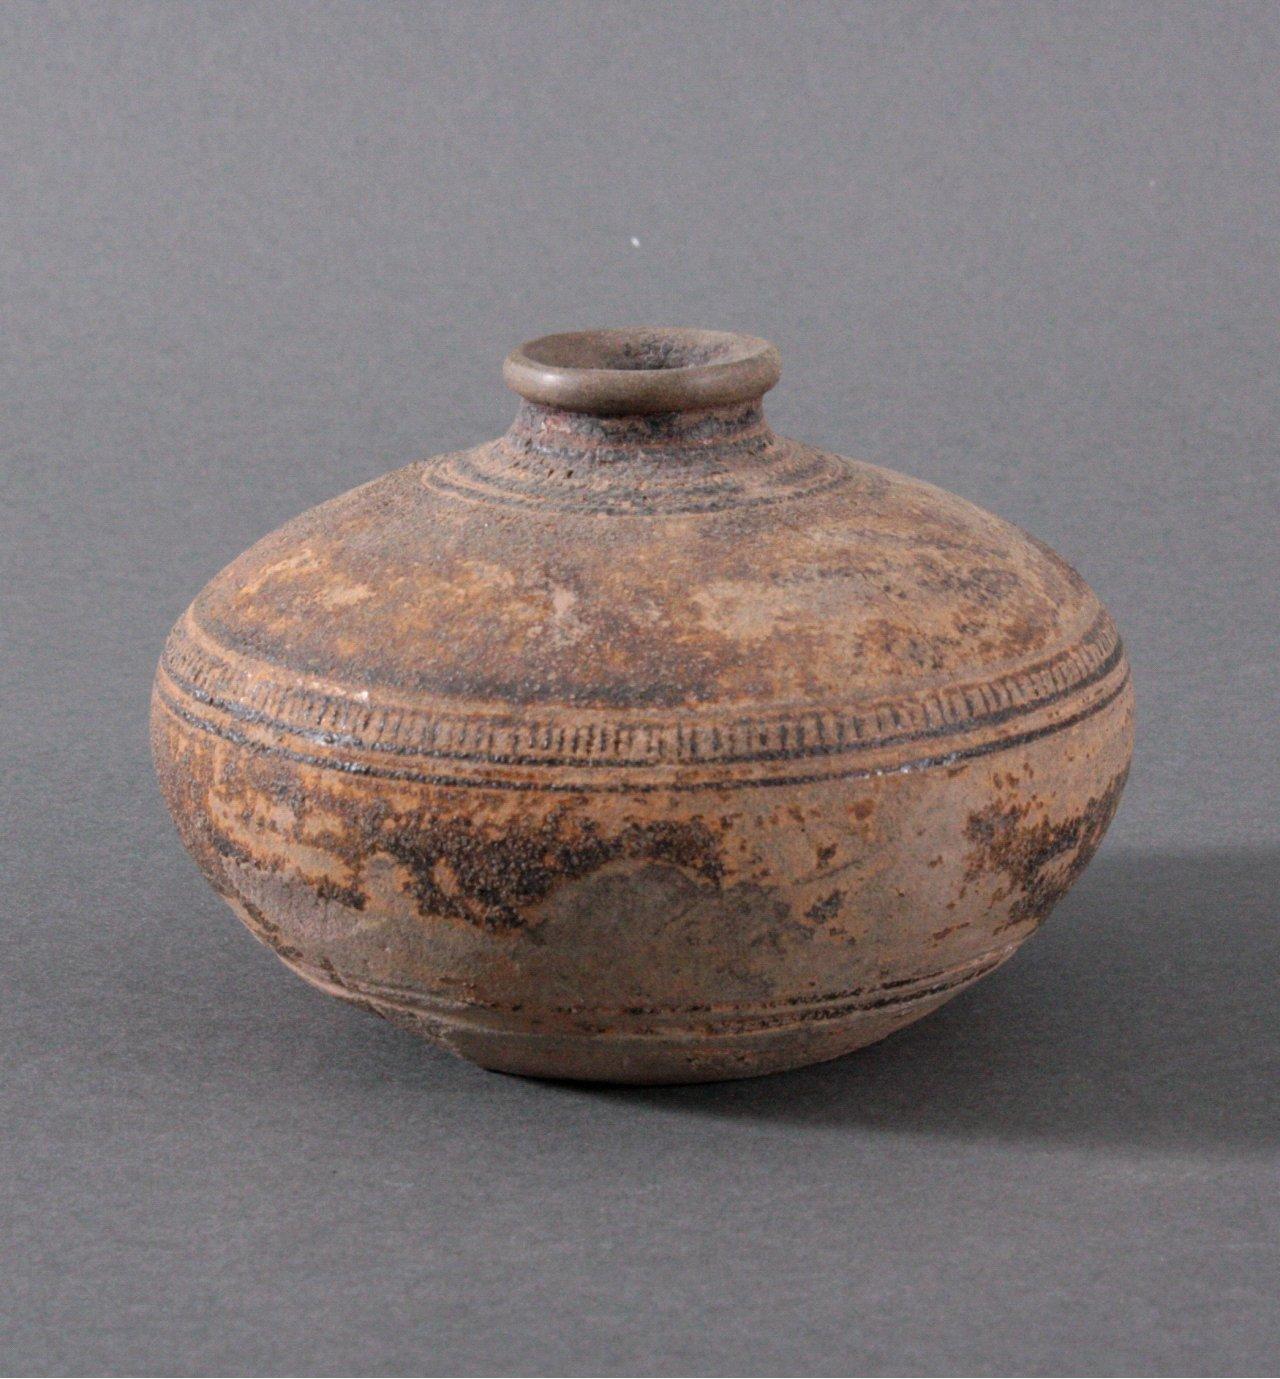 Kleines Vorratsgefäß, Angkor-Periode 12./13. Jh.-1